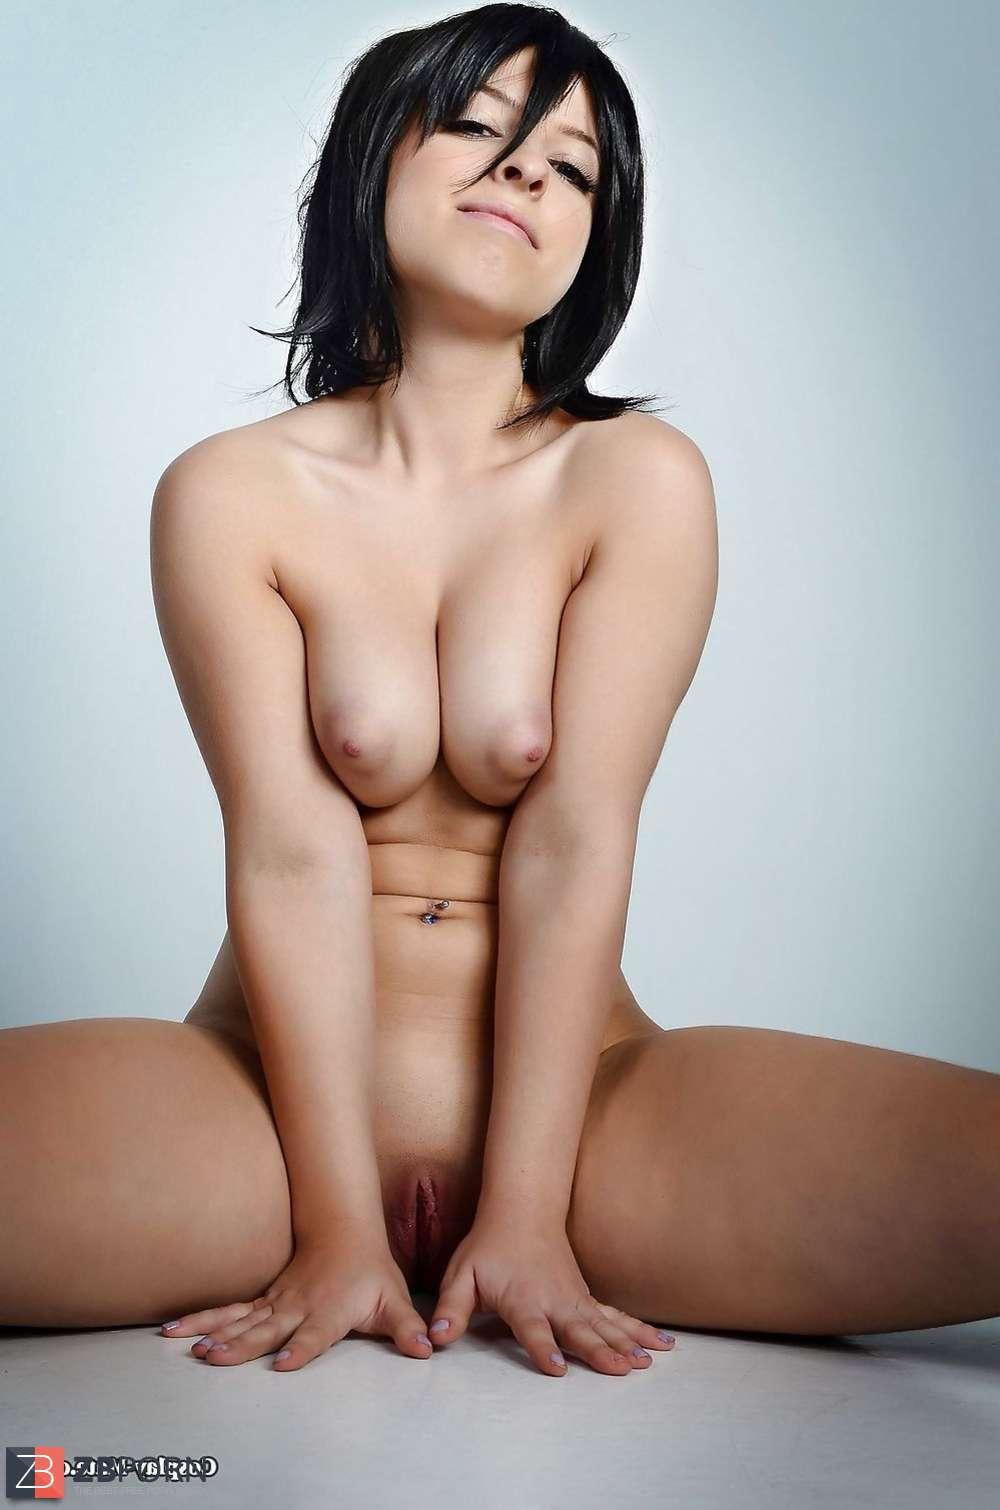 south carolina hot girl porn